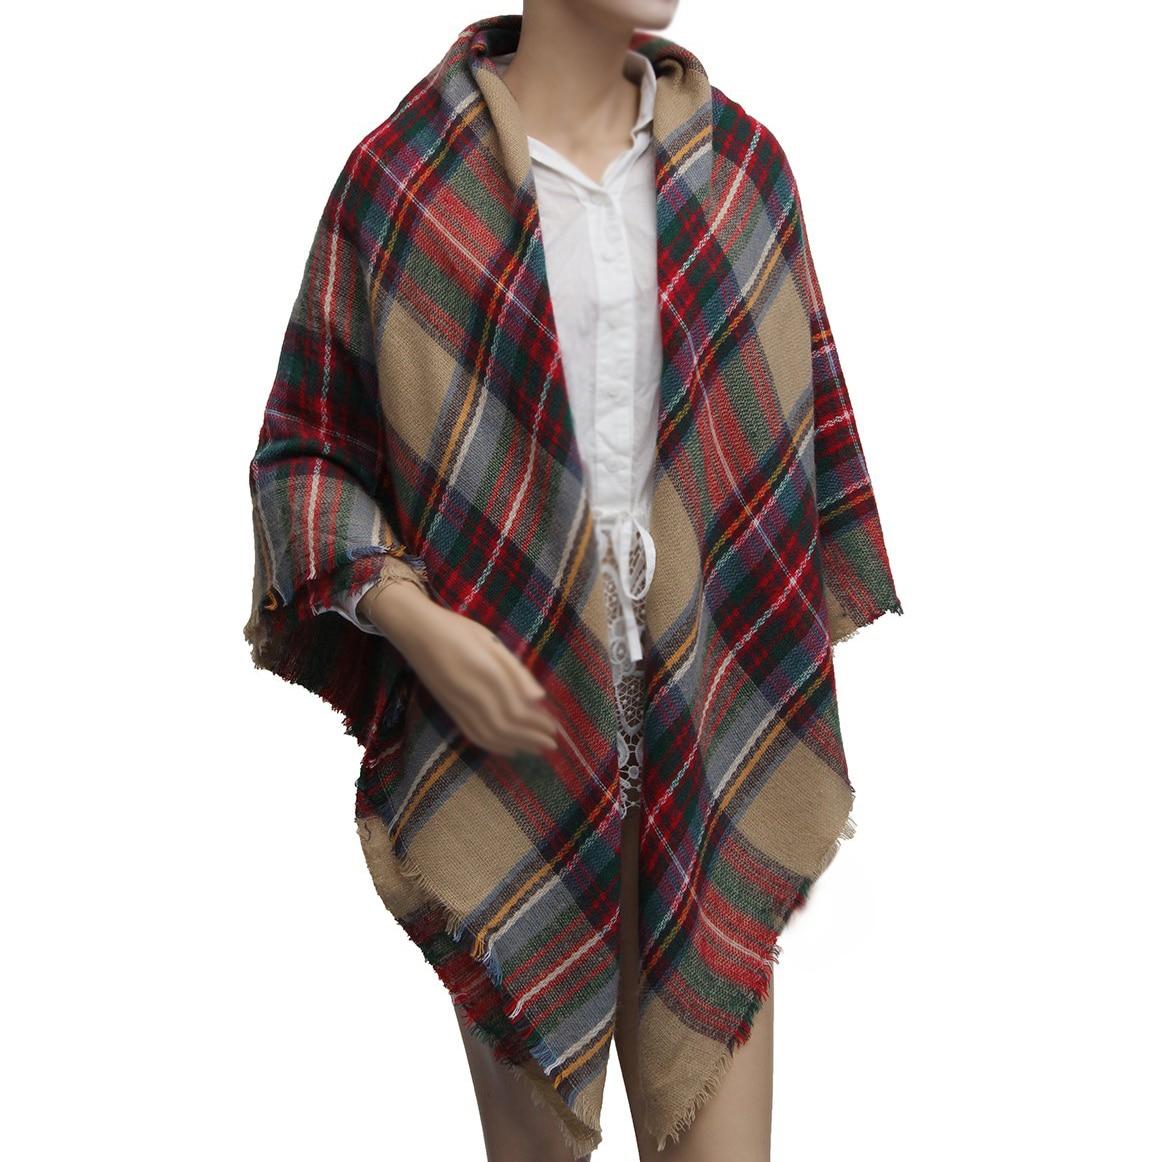 DSGS Women wide Pashmina font b Tartan b font wrapped scarf shawl stole red Plaid collar